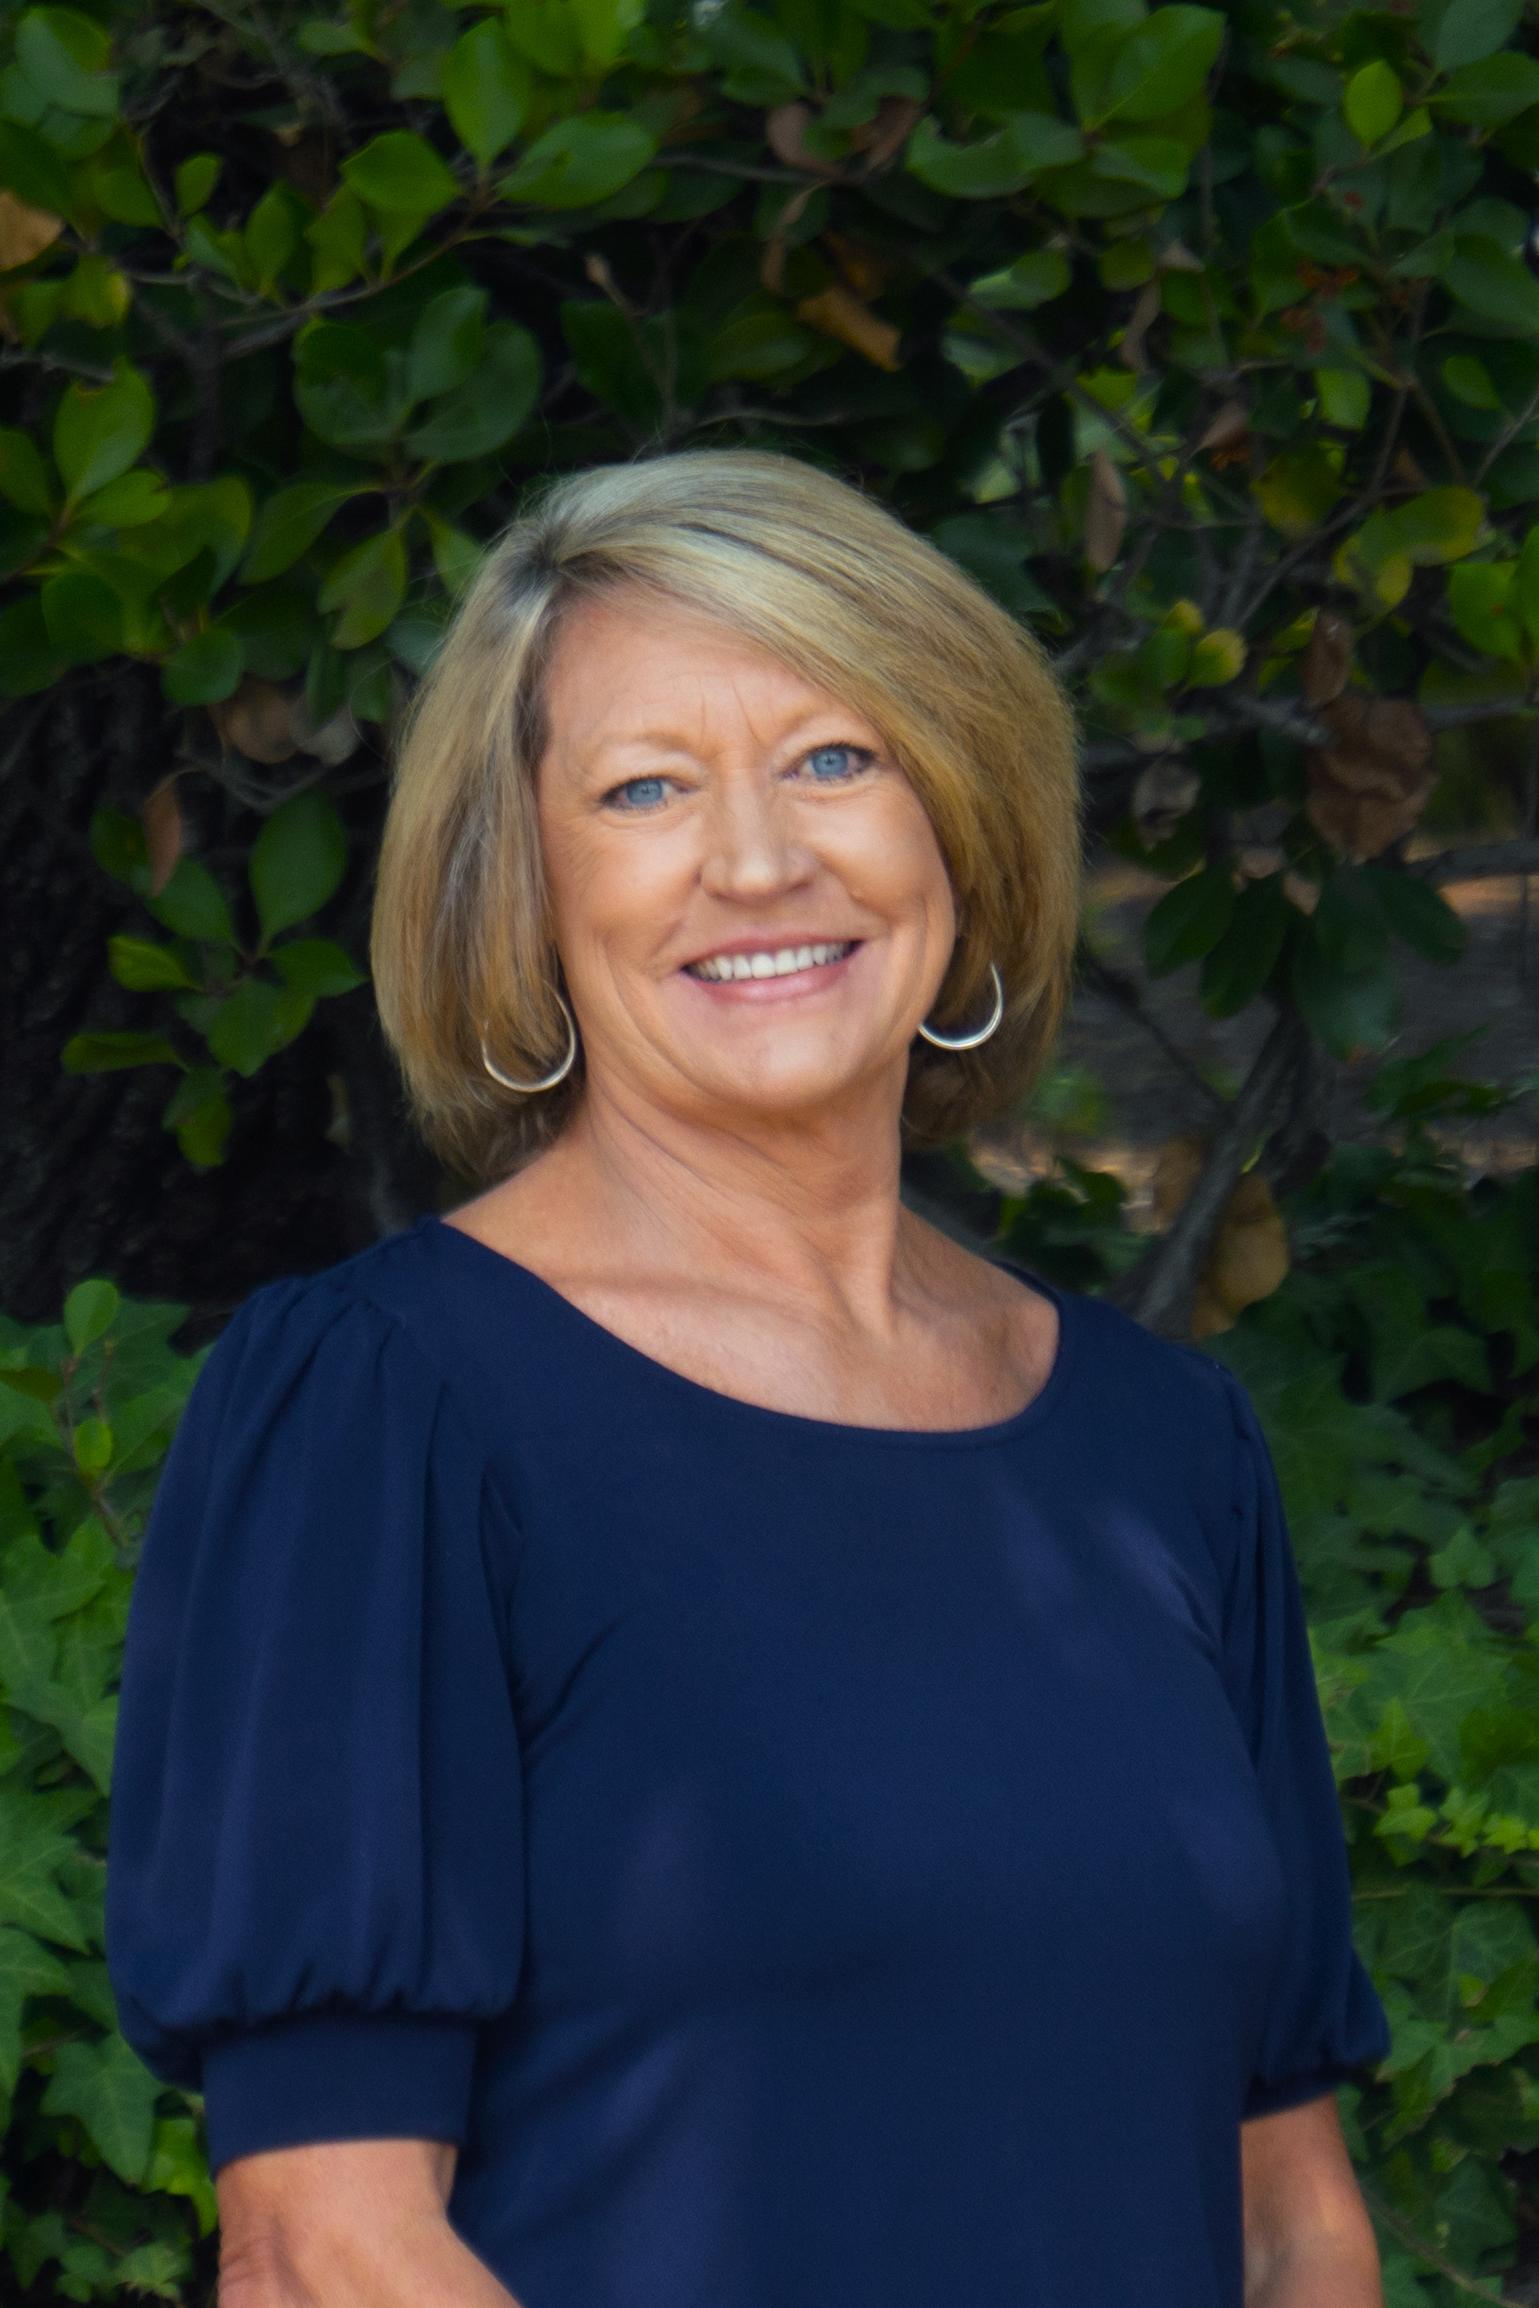 Juli Carey, Director of Operations